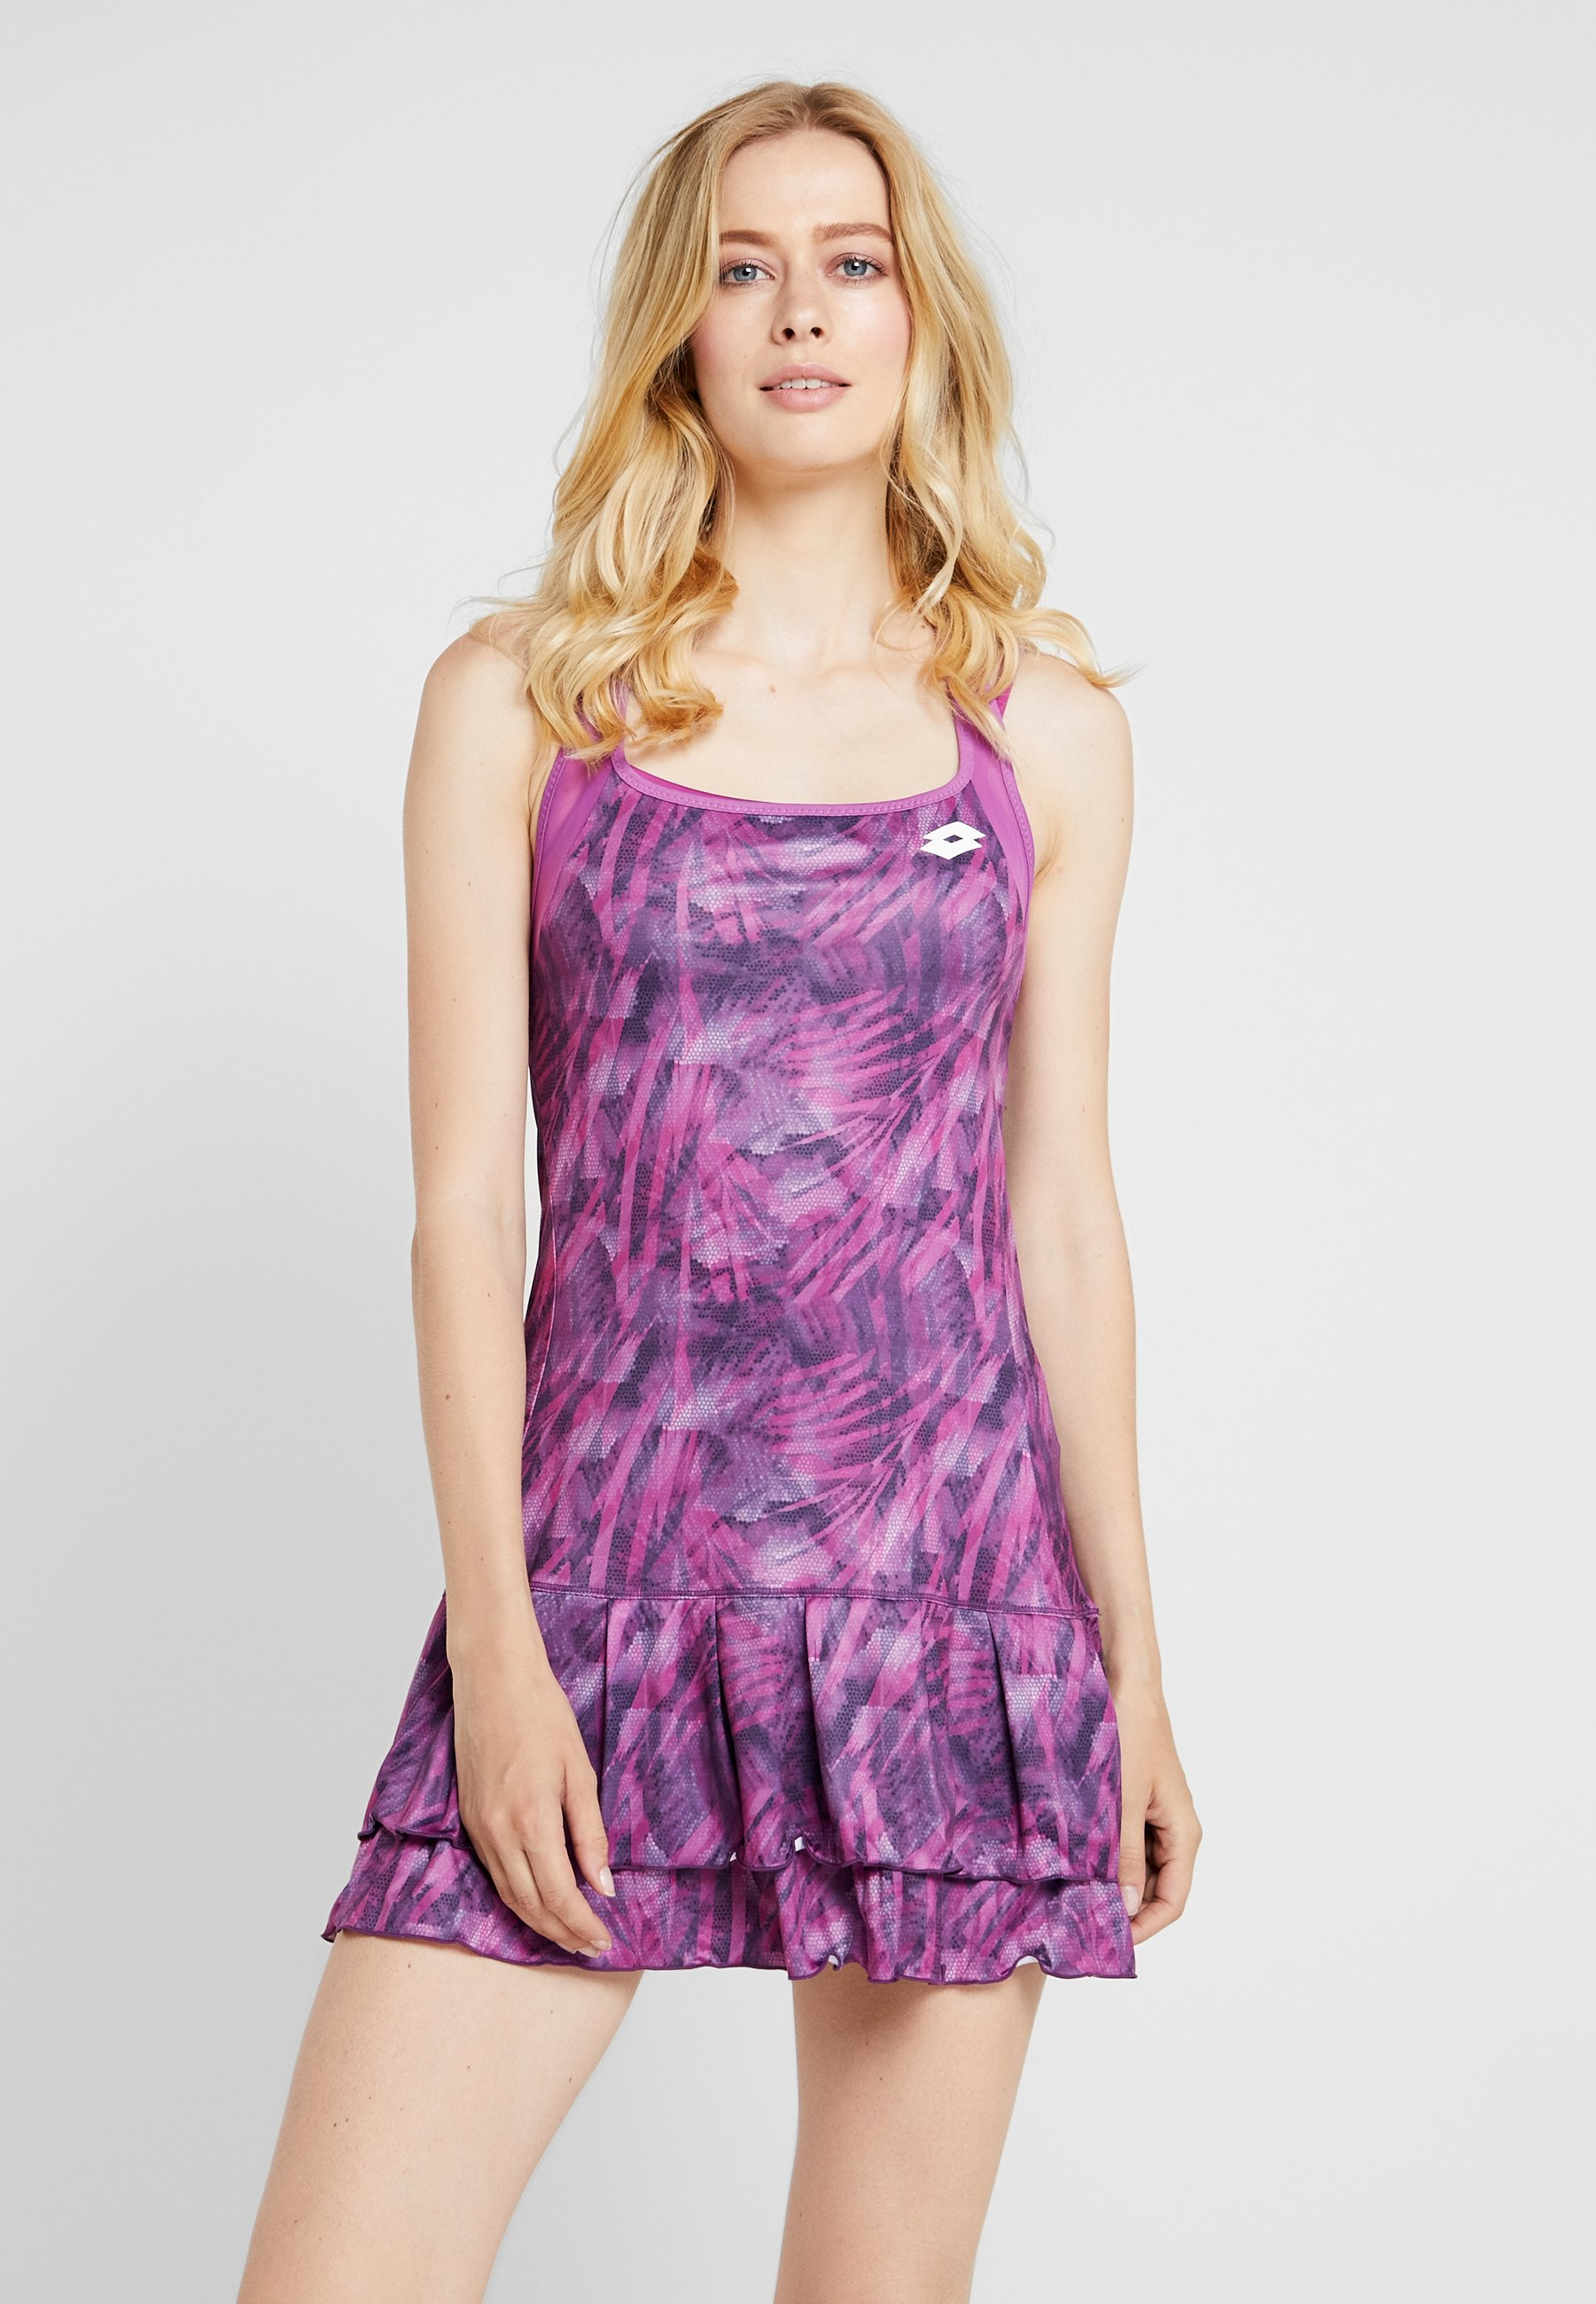 Ten 2 Top Lotto Sport Purple in De 1Robe Willow Dress dWQrBeCoEx